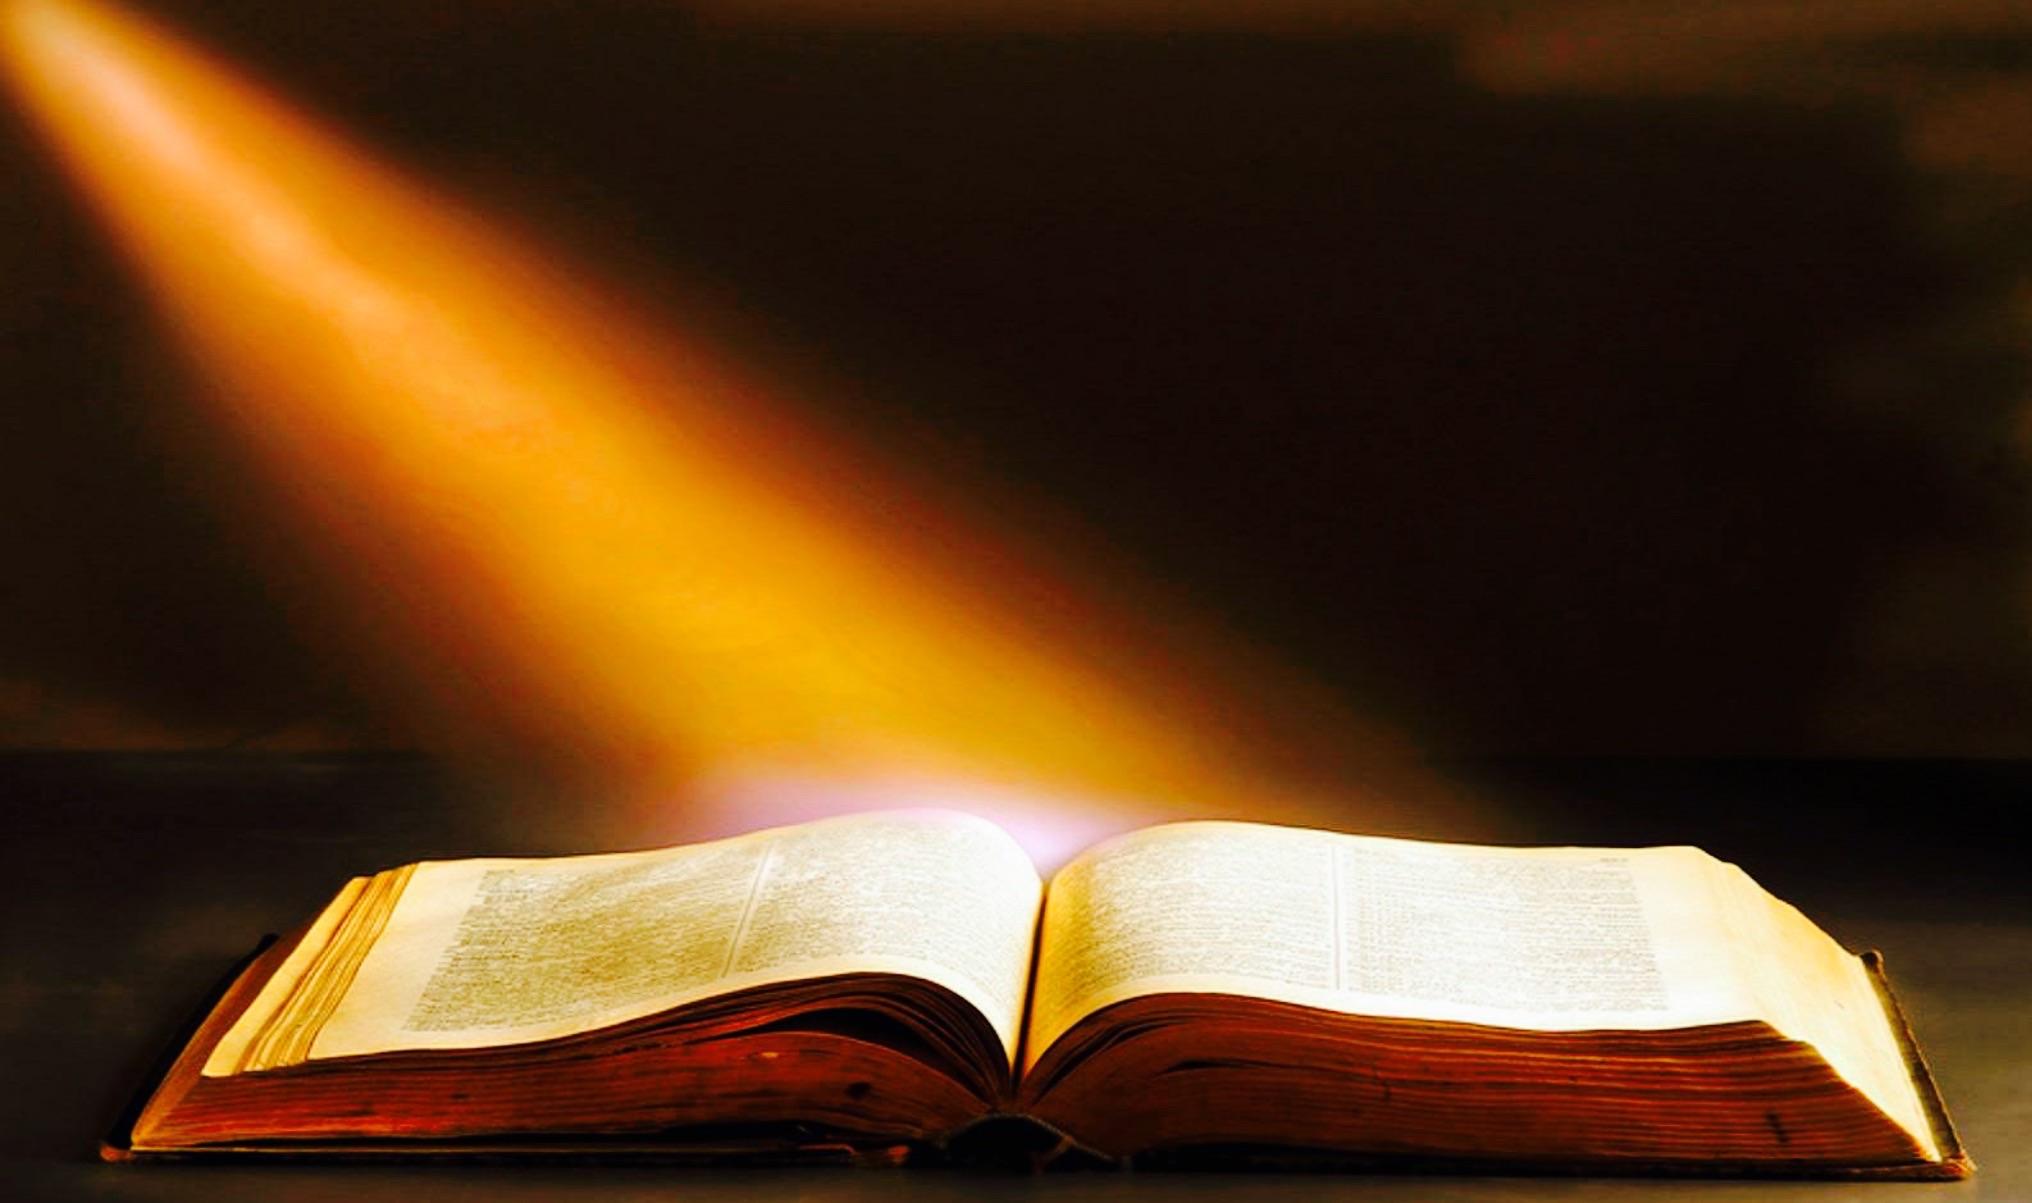 2000 believe church essay in in ordination woman words